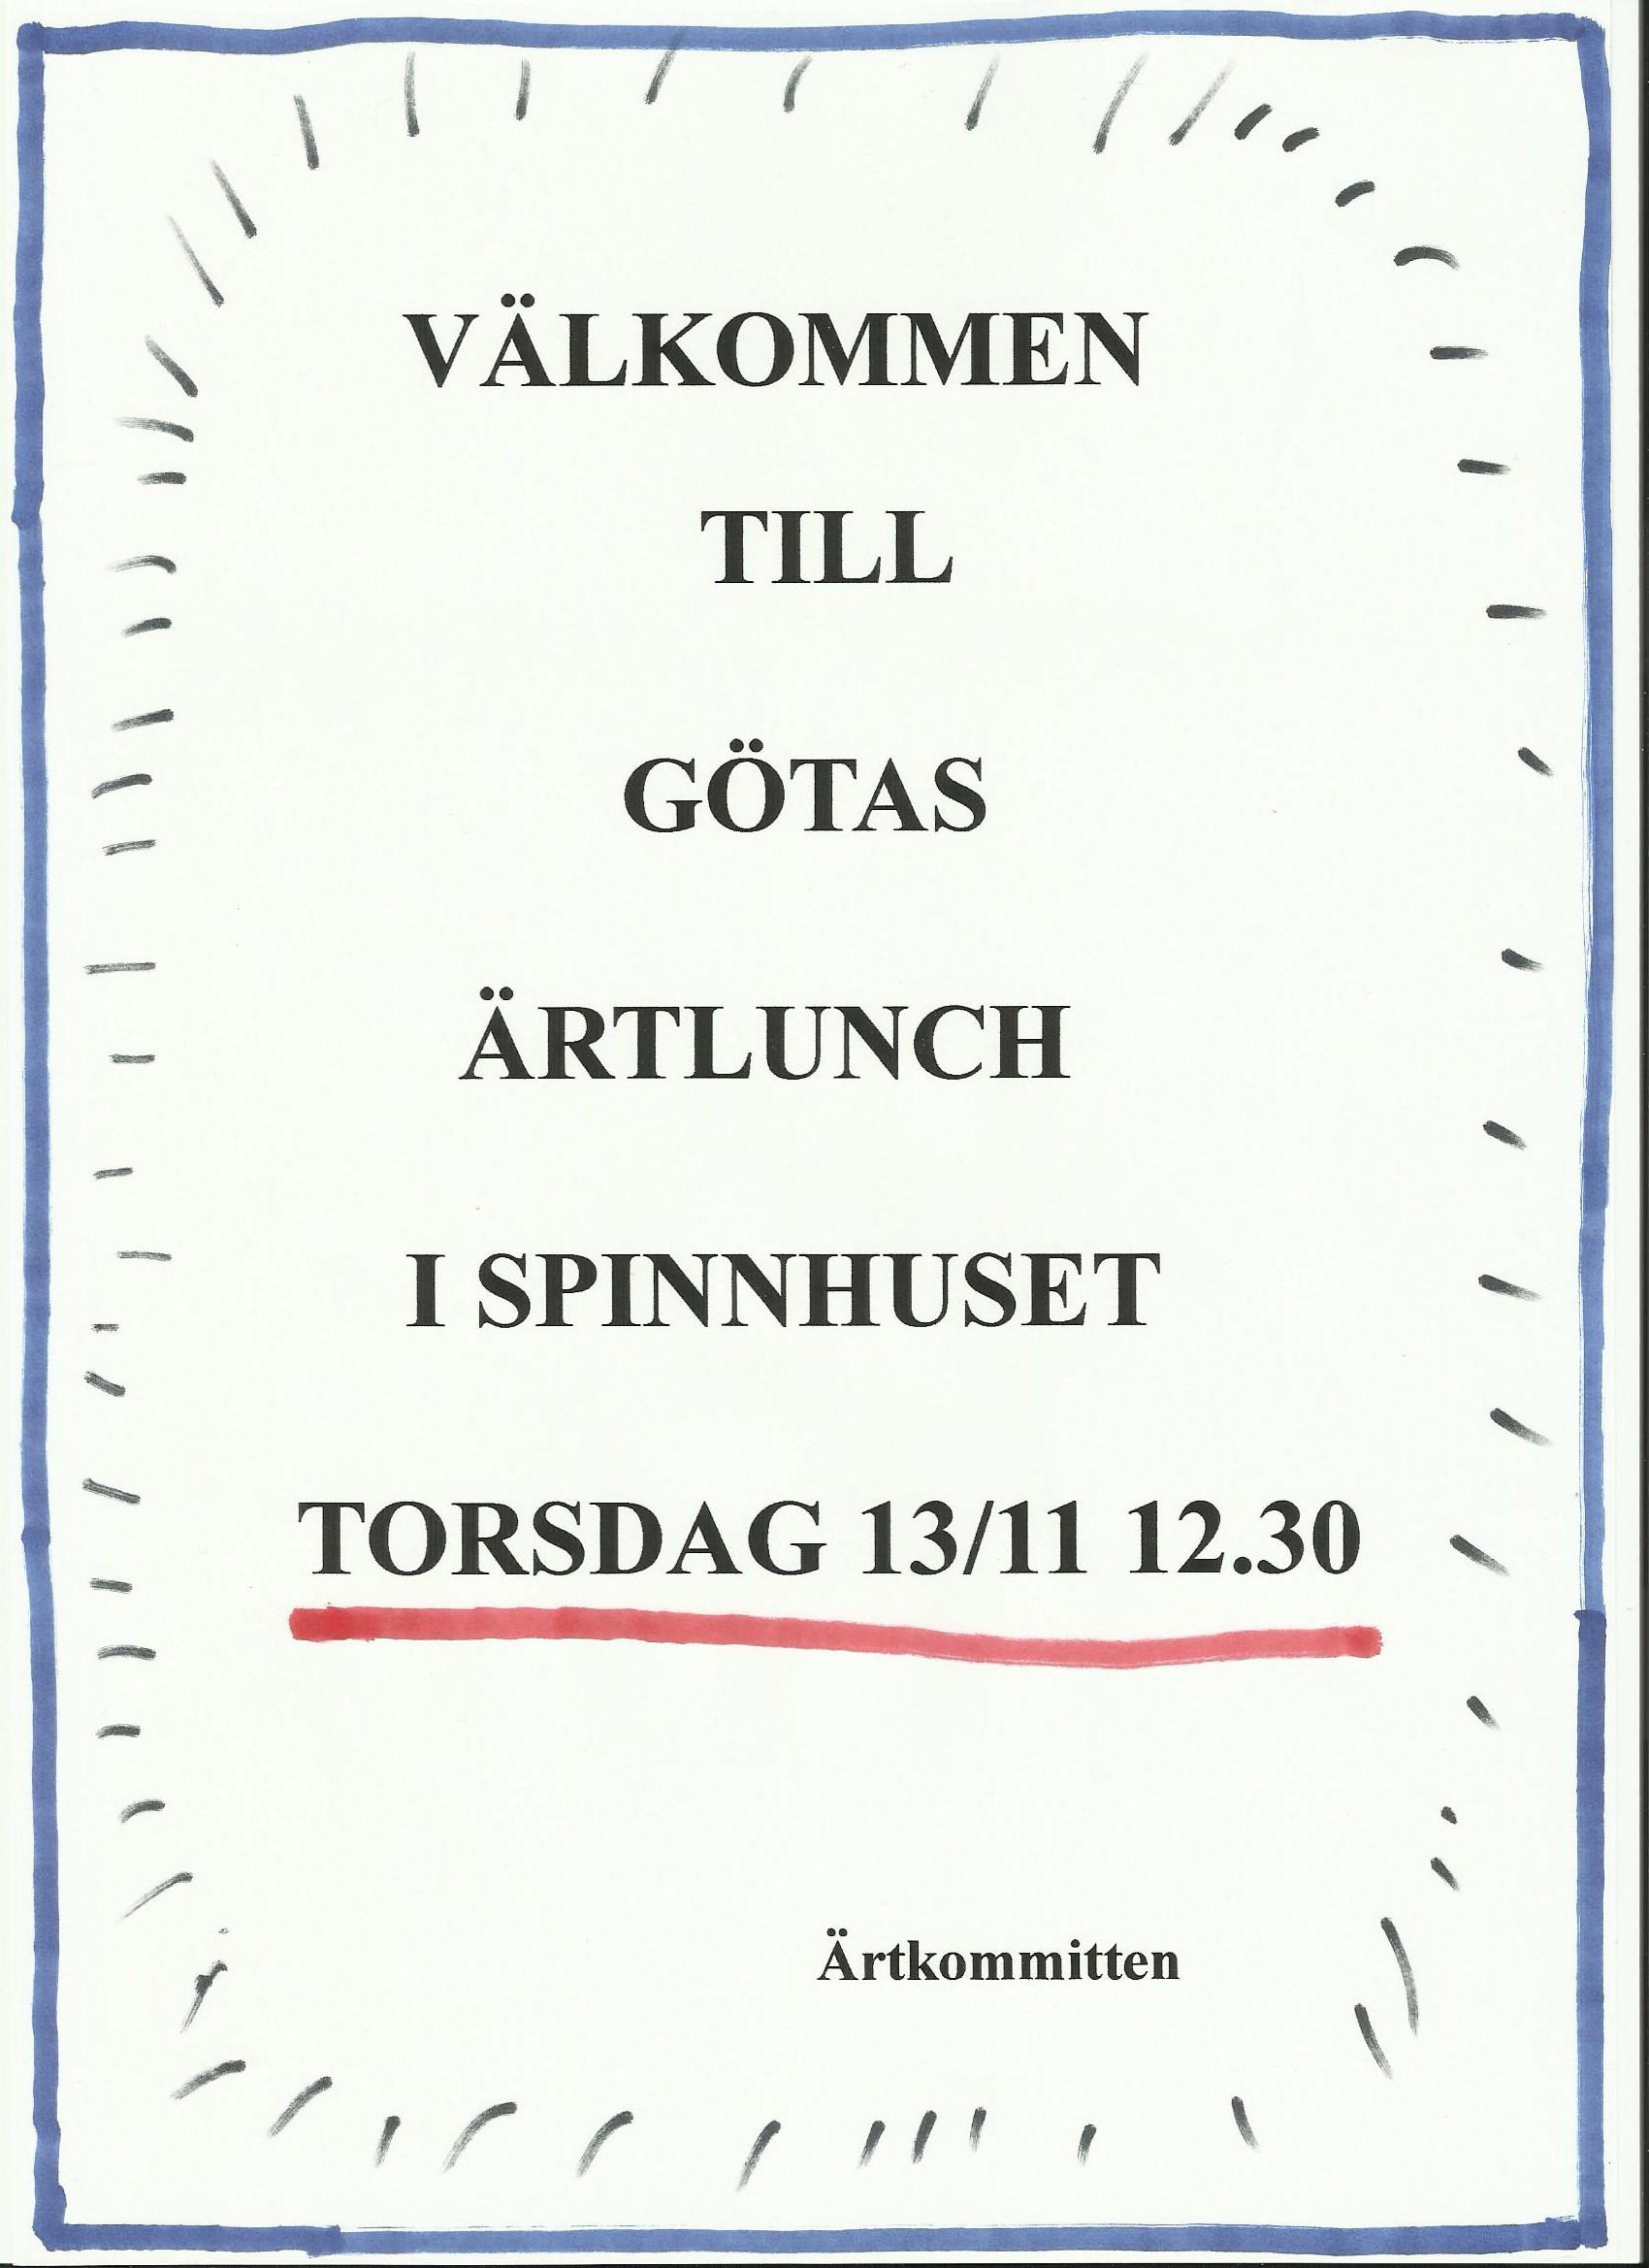 Ätylunch2 13-11-2014 001